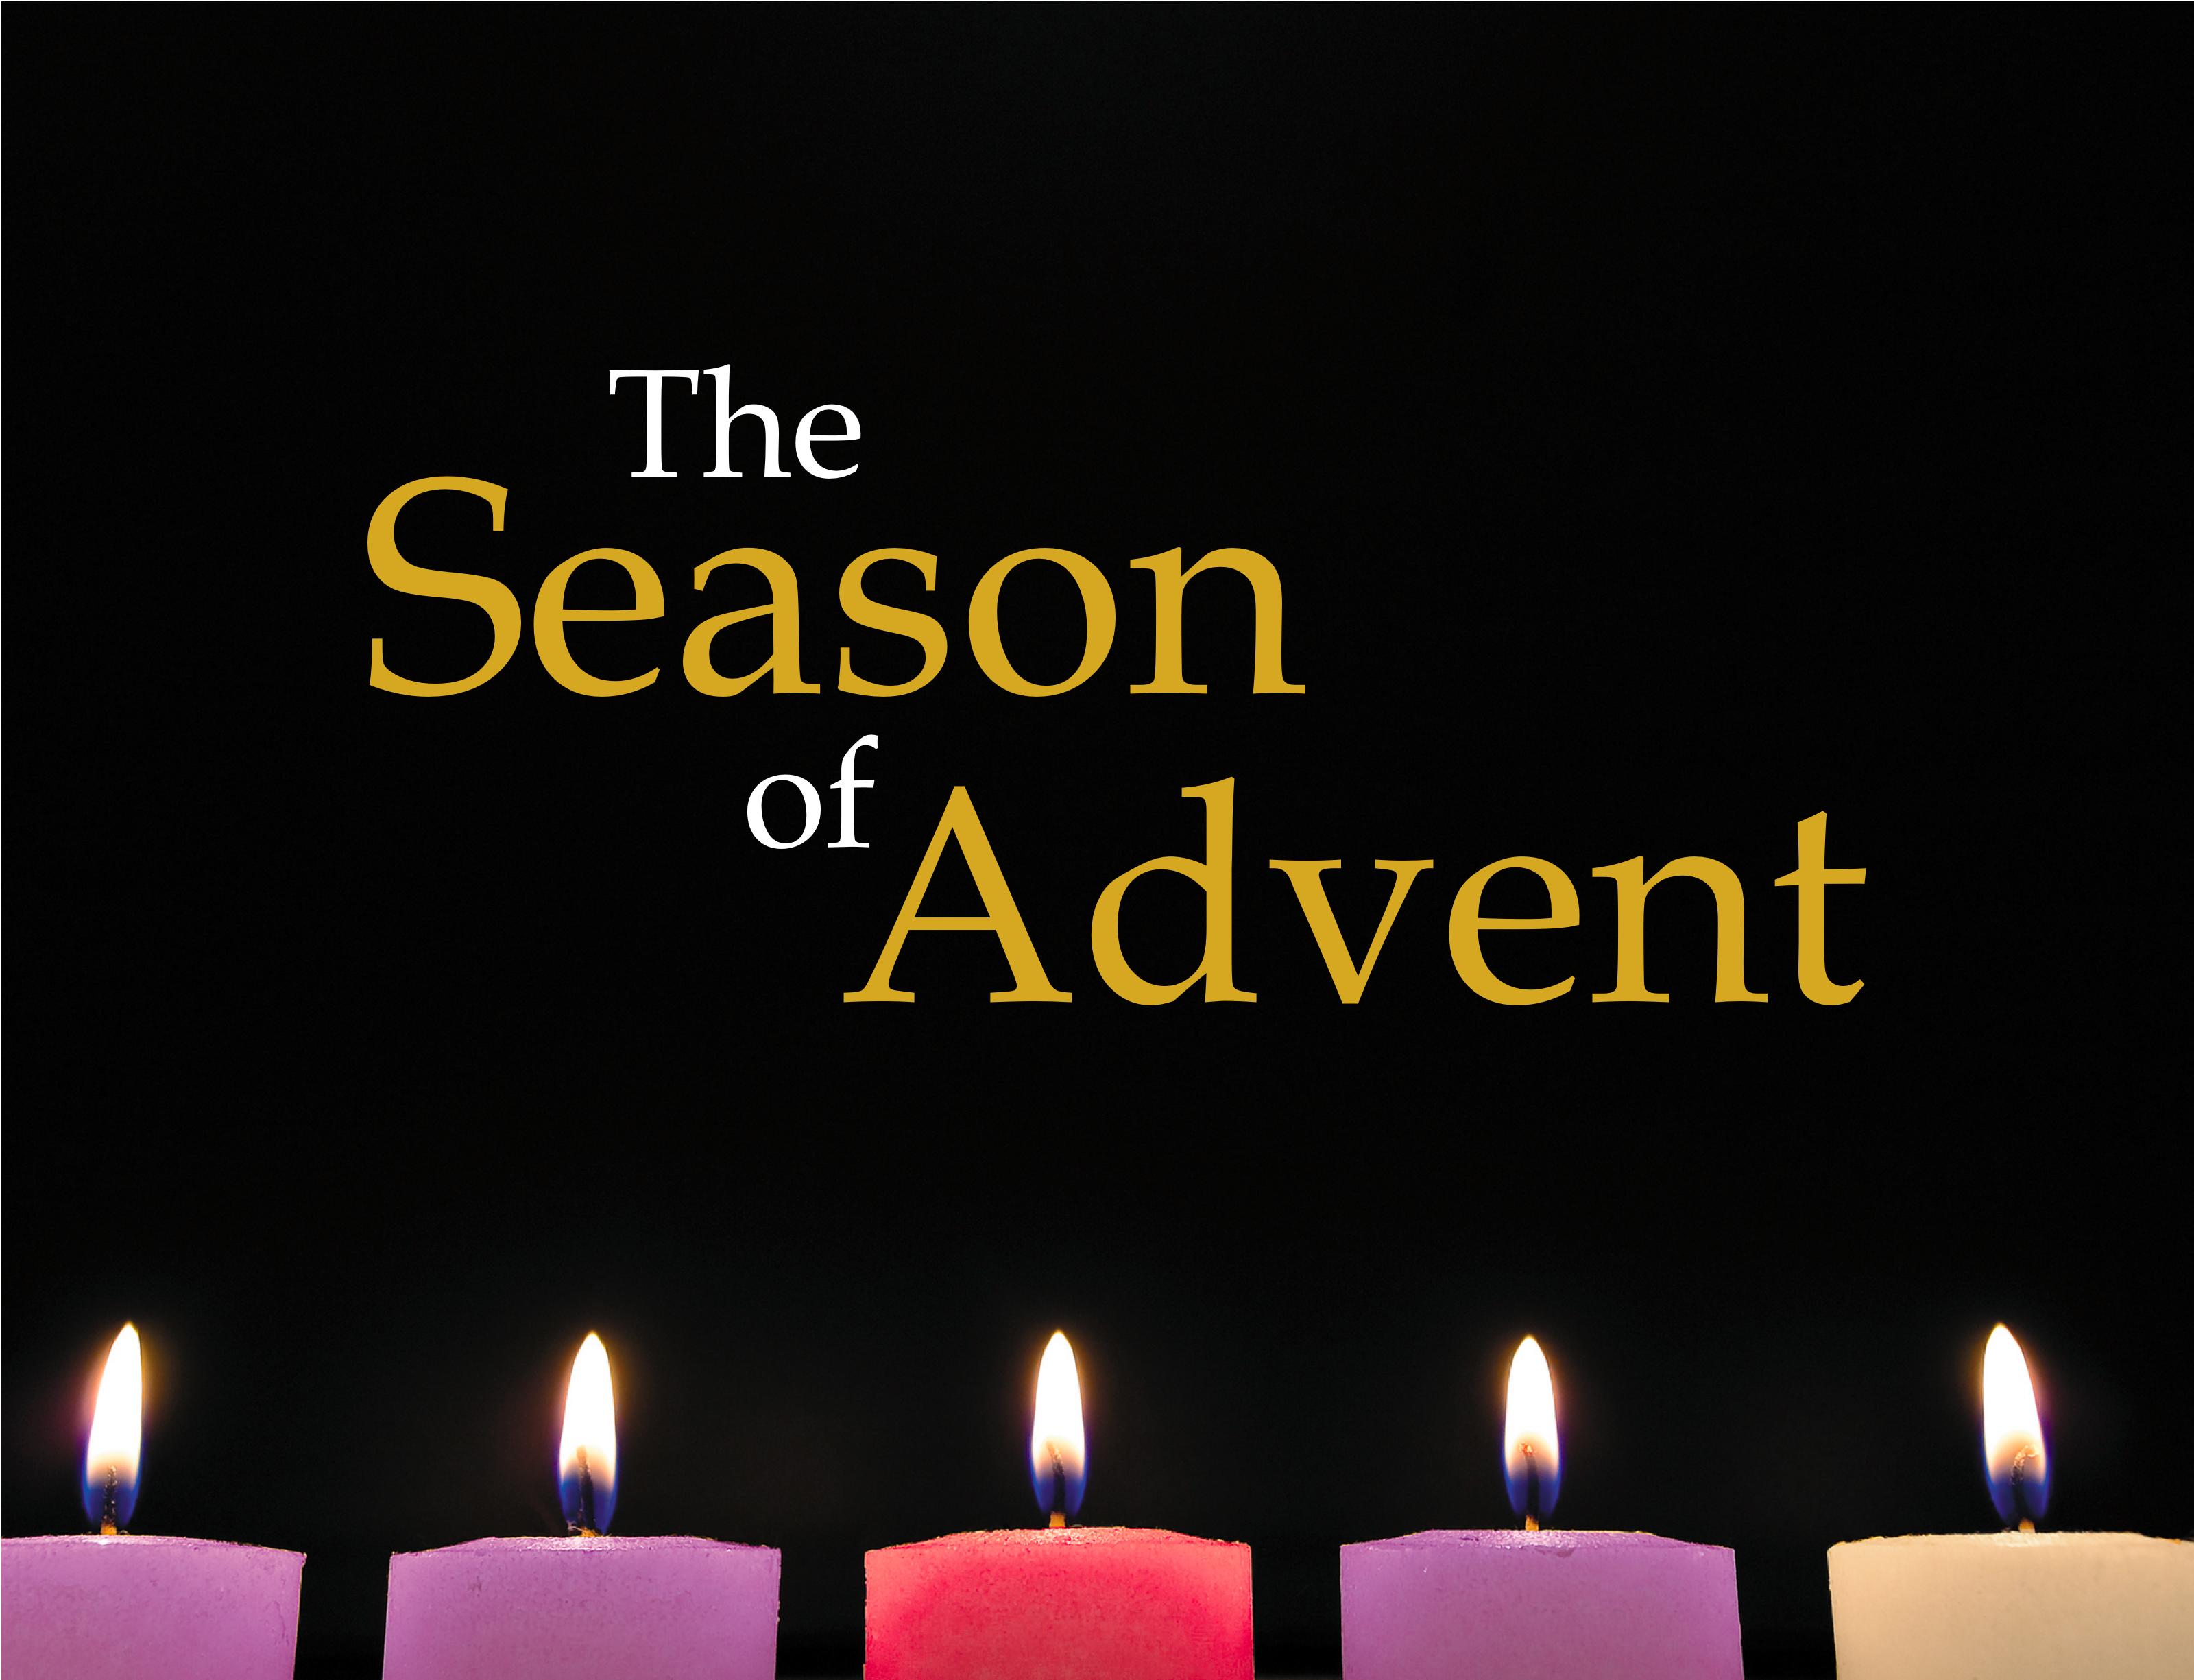 adventures in the season of advent thyblackman